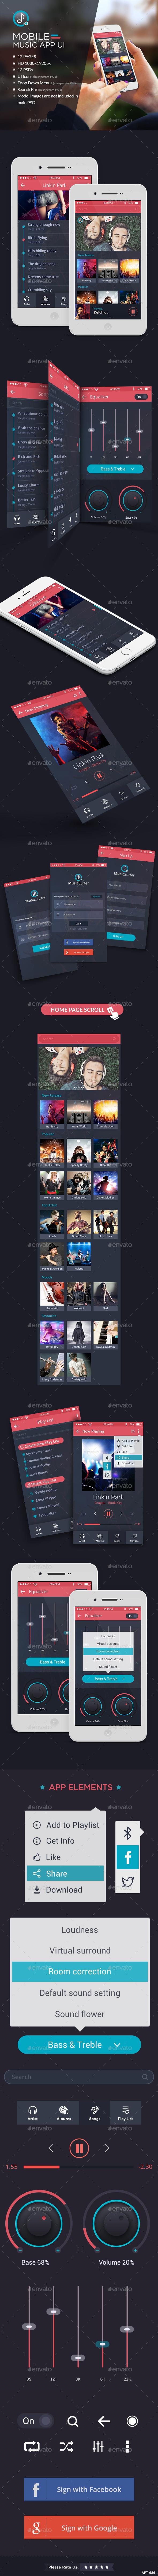 GraphicRiver Mobile Music App UI Kit HD 11859671